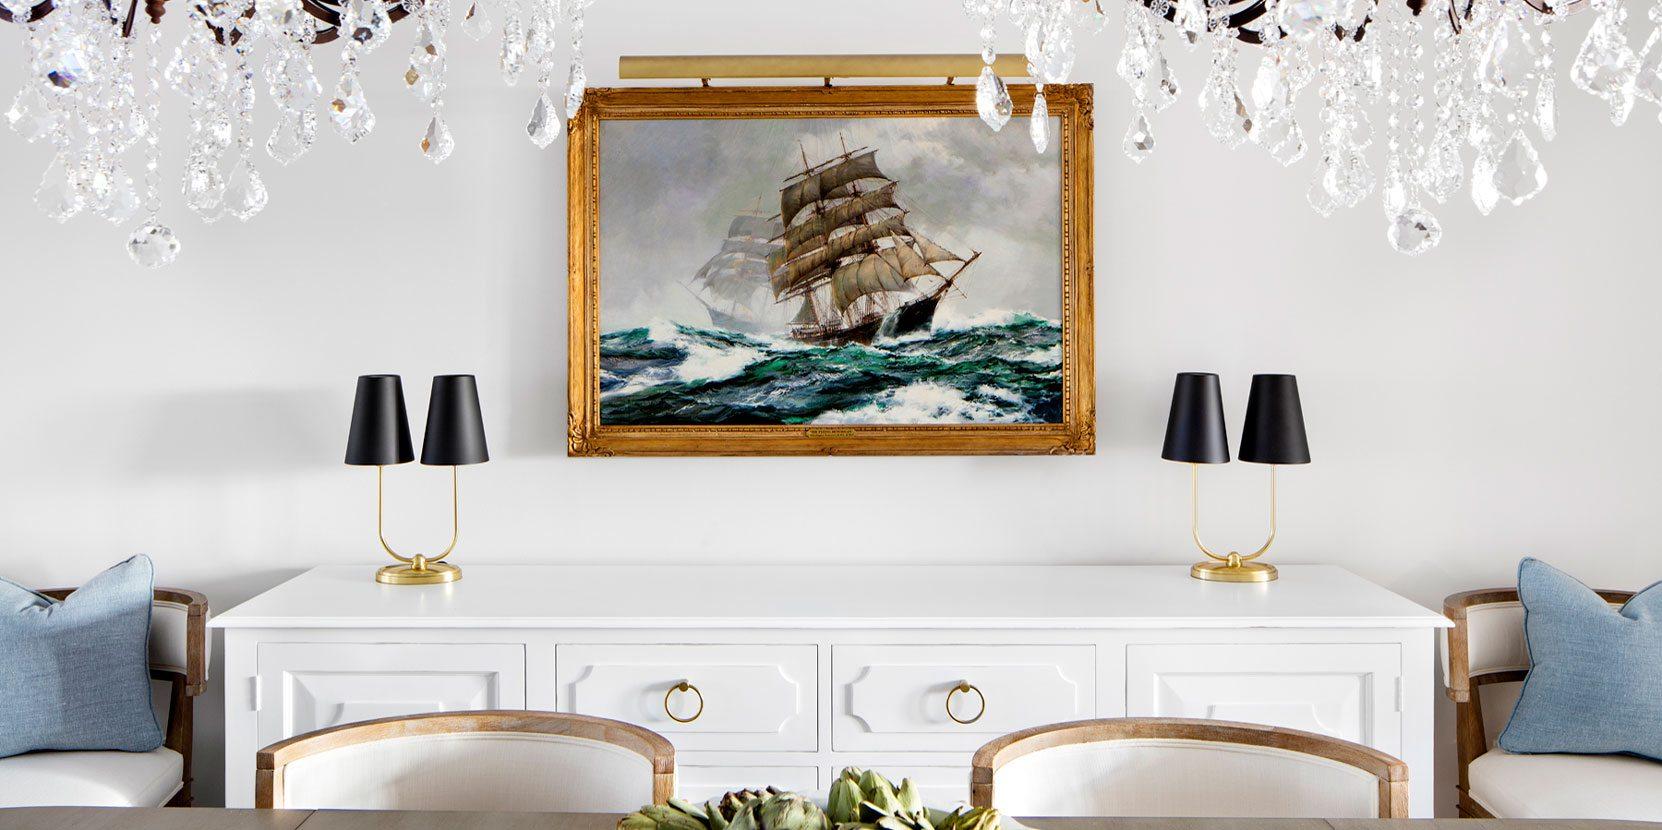 Dining Room | Bria Hammel Interiors